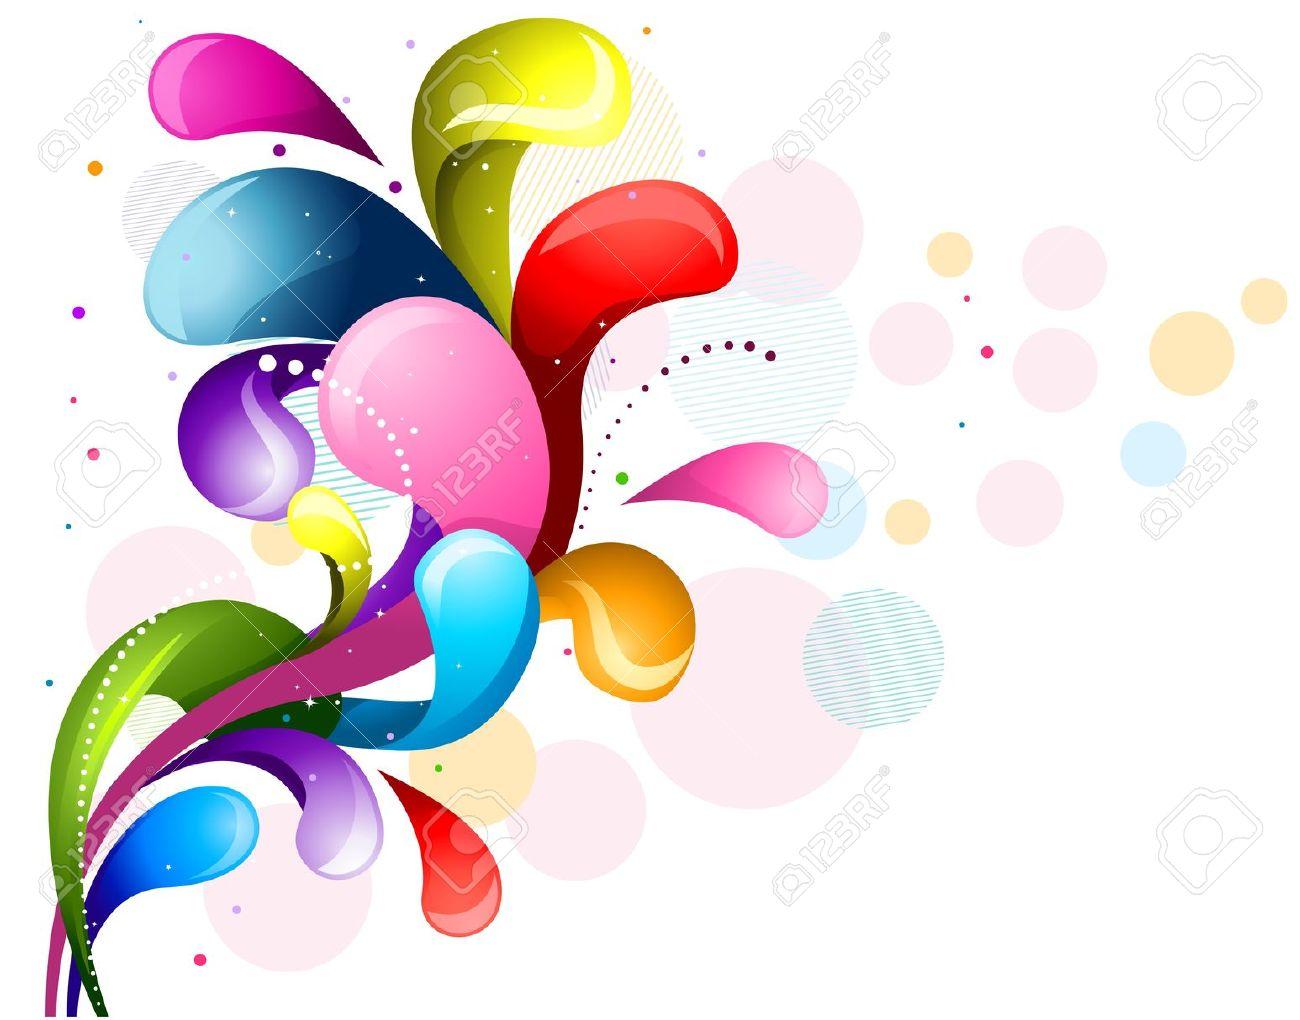 Backgrounds Hd Tie Dye Colorful Vortex Swirls Wallpaper: Colorful Swirls Backgrounds